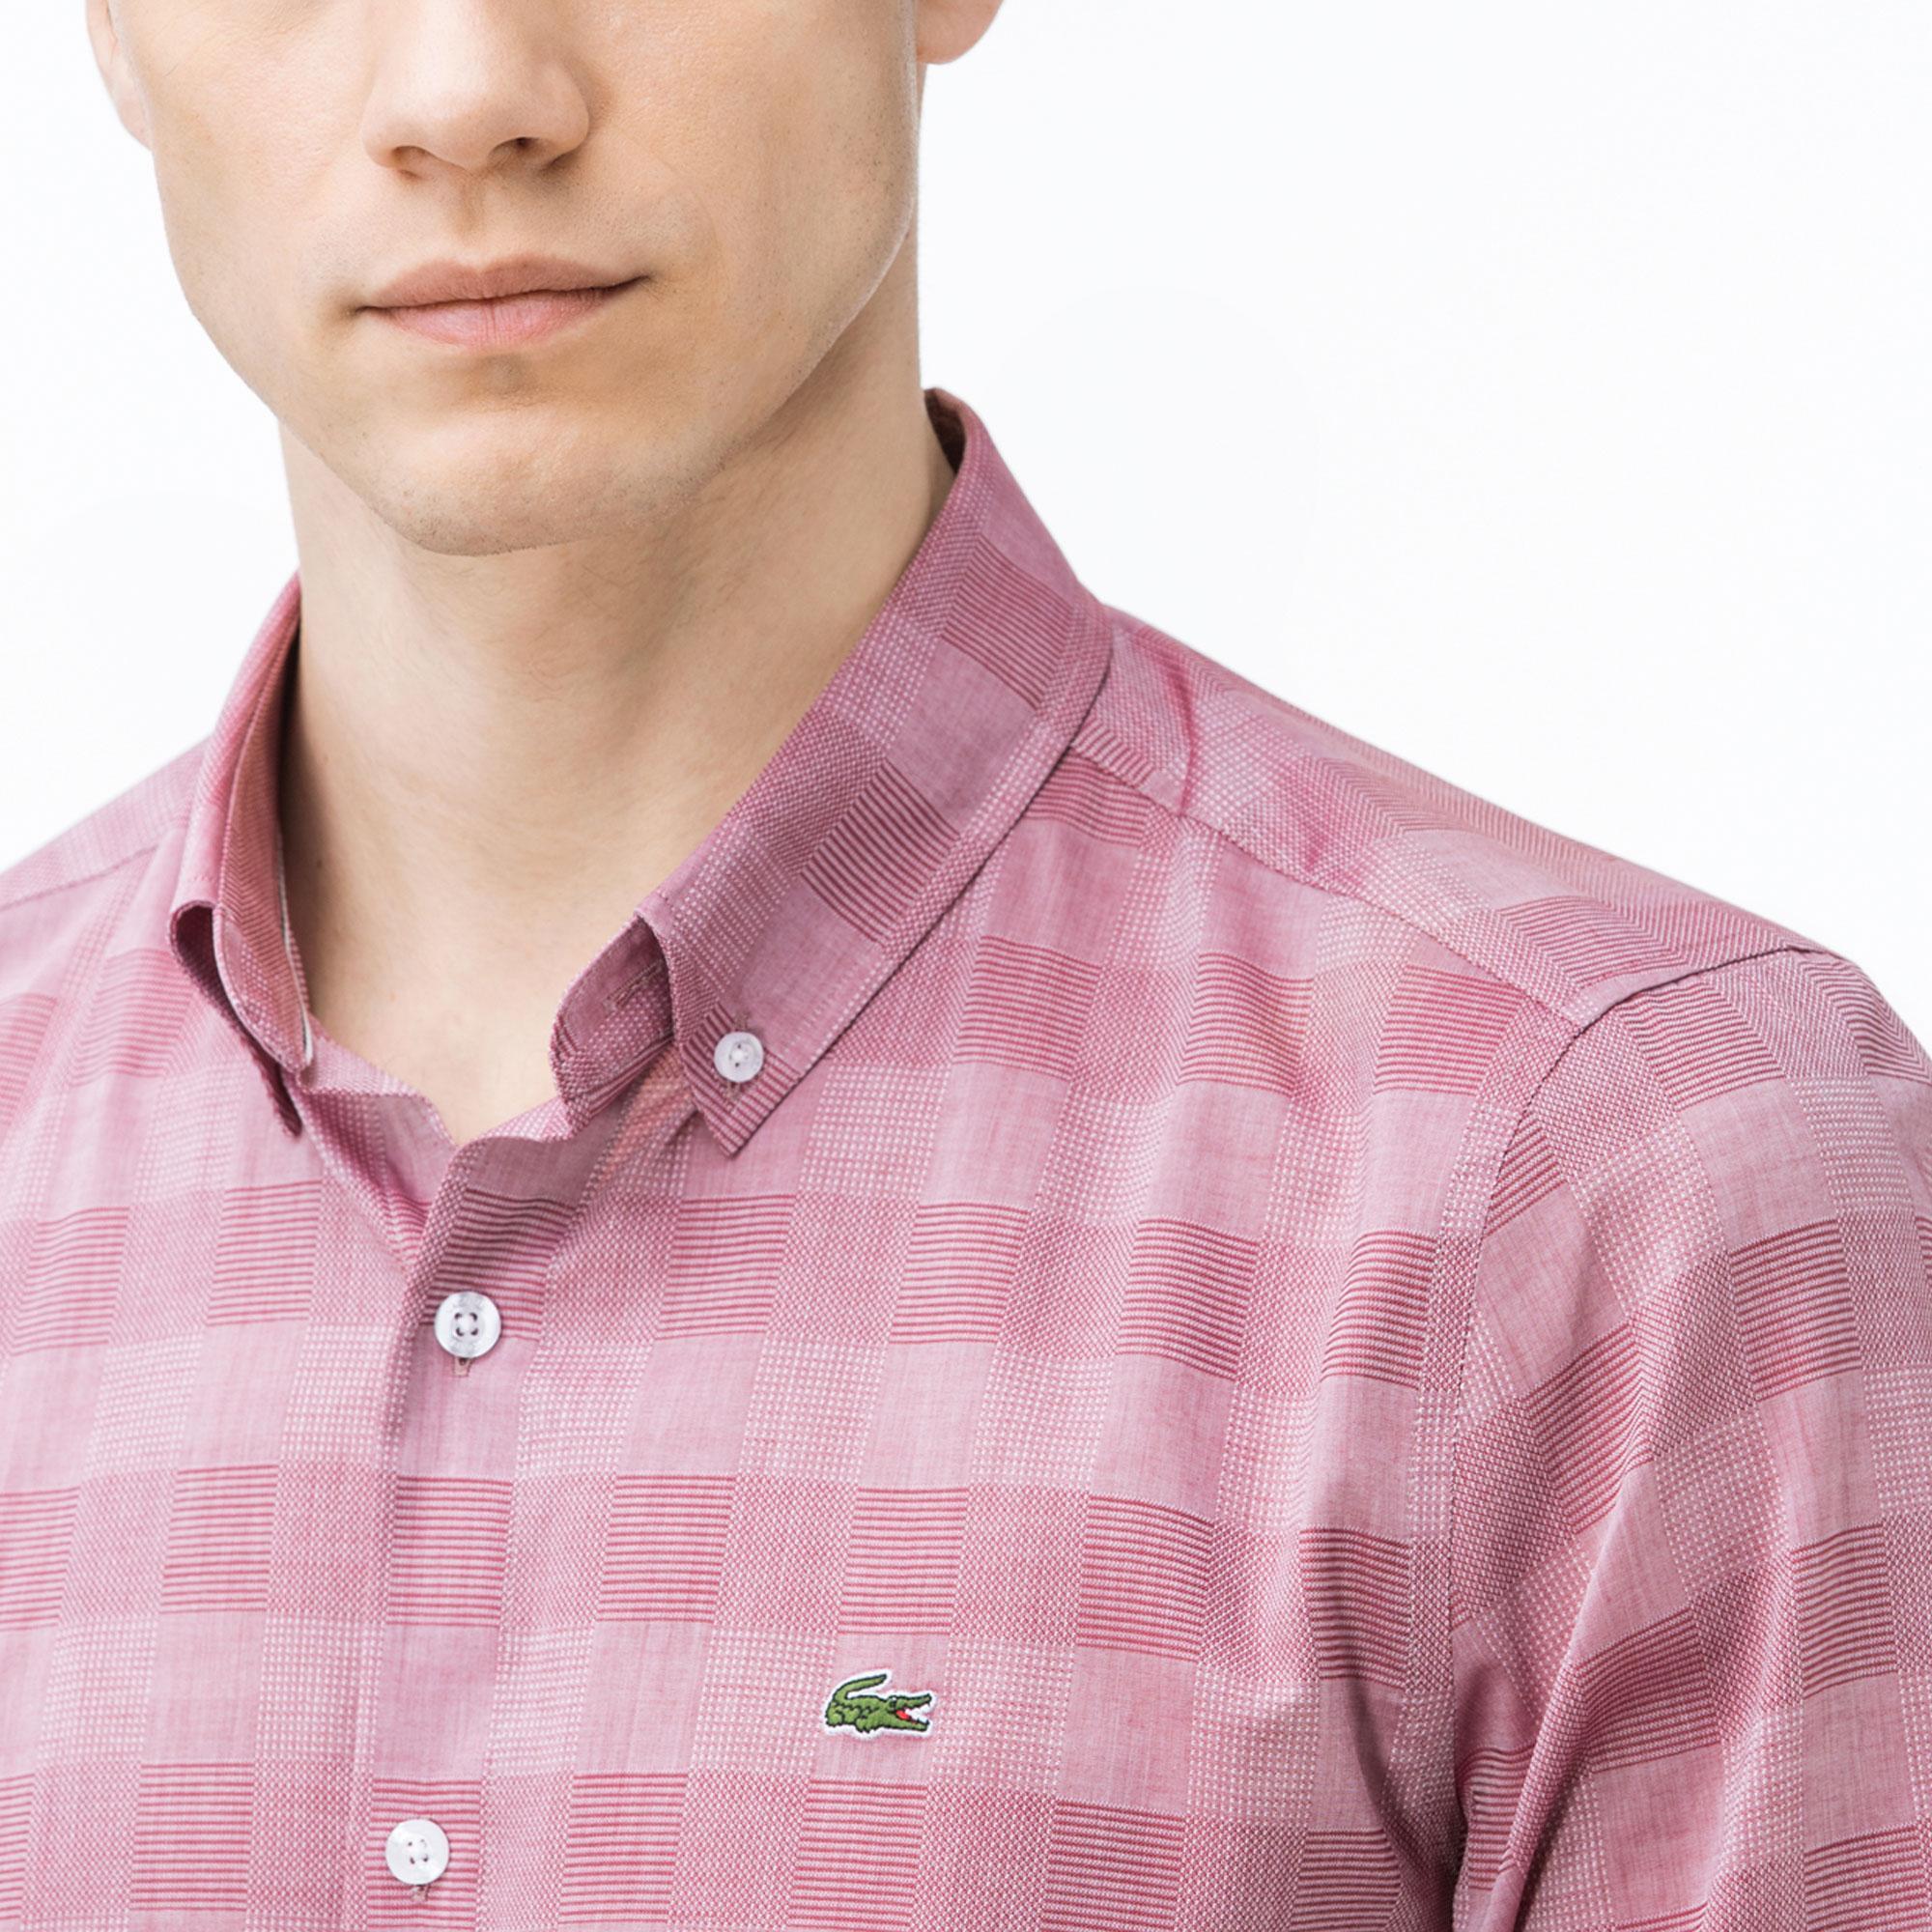 Lacoste Erkek Slim Fit Ekose Bordo Gömlek